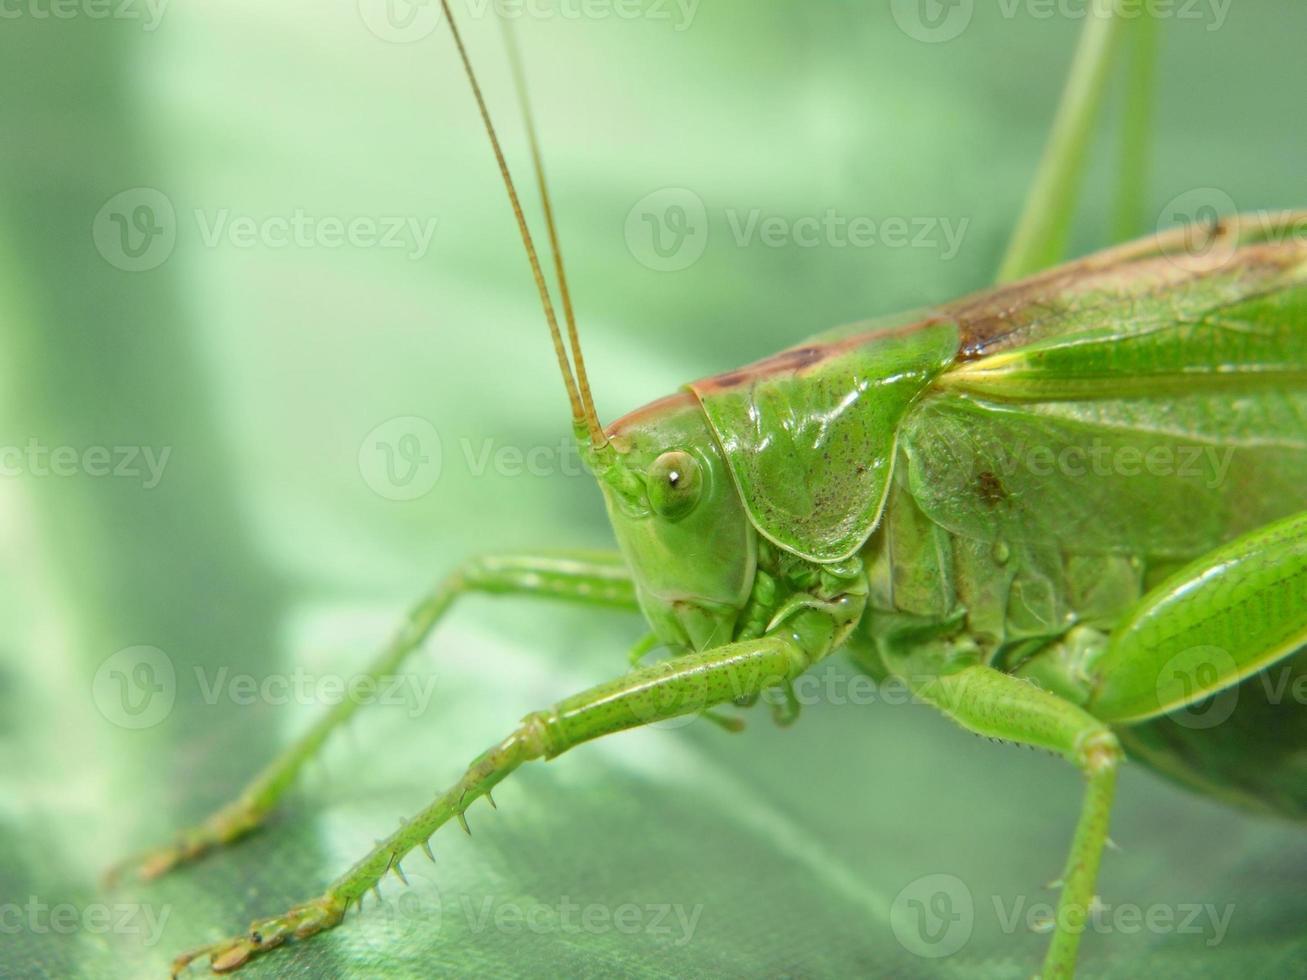 langosta verde foto